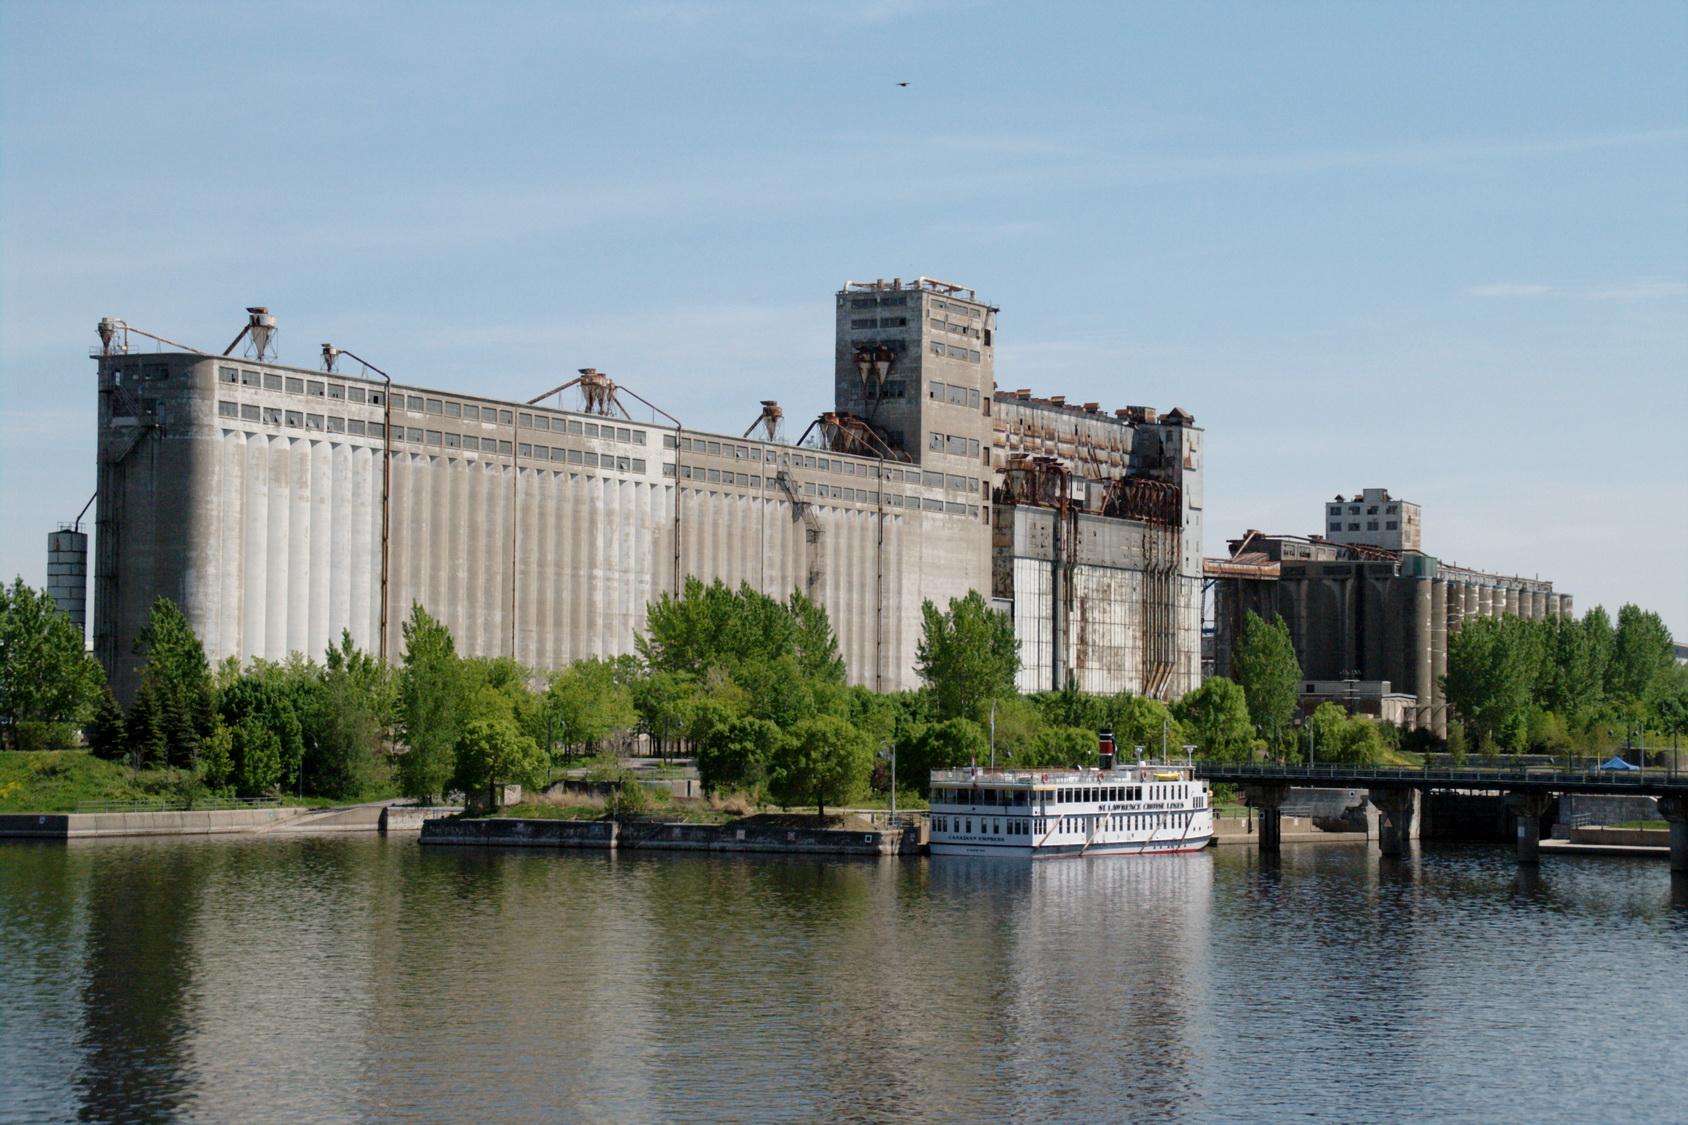 patrimoine industriel montreal : silo n°5